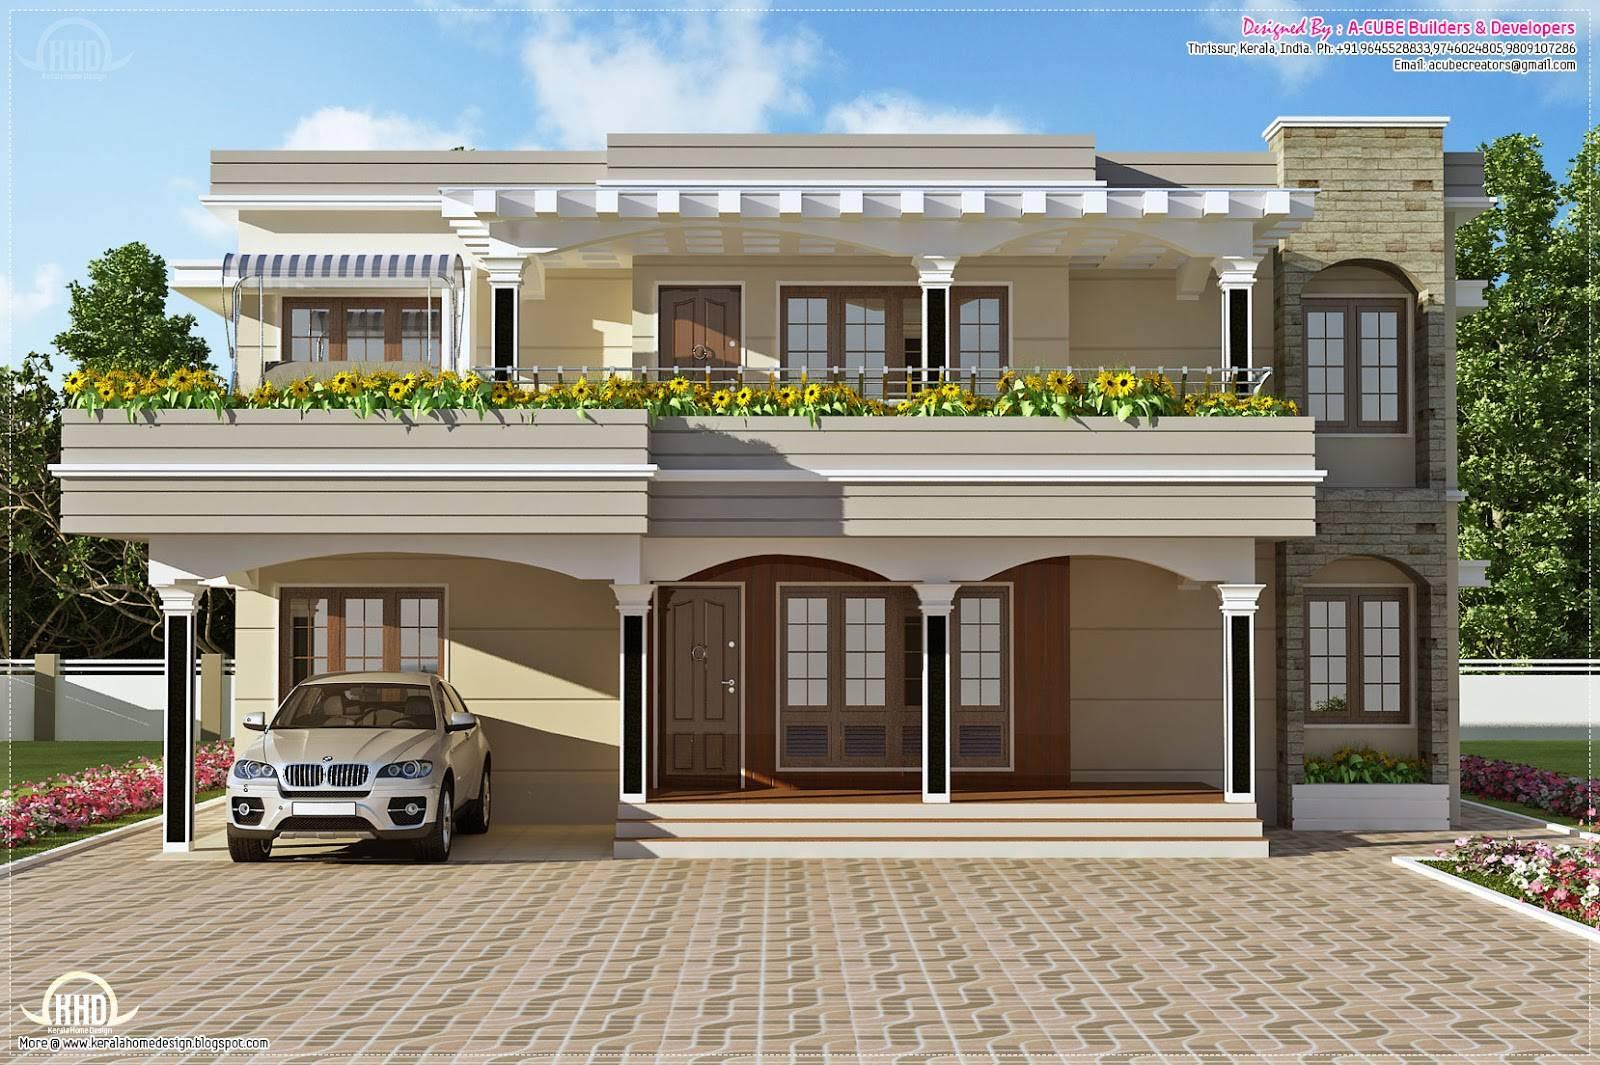 Modern Flat Roof Villa Feet Home Kerala Plans Home Plans Blueprints 86061